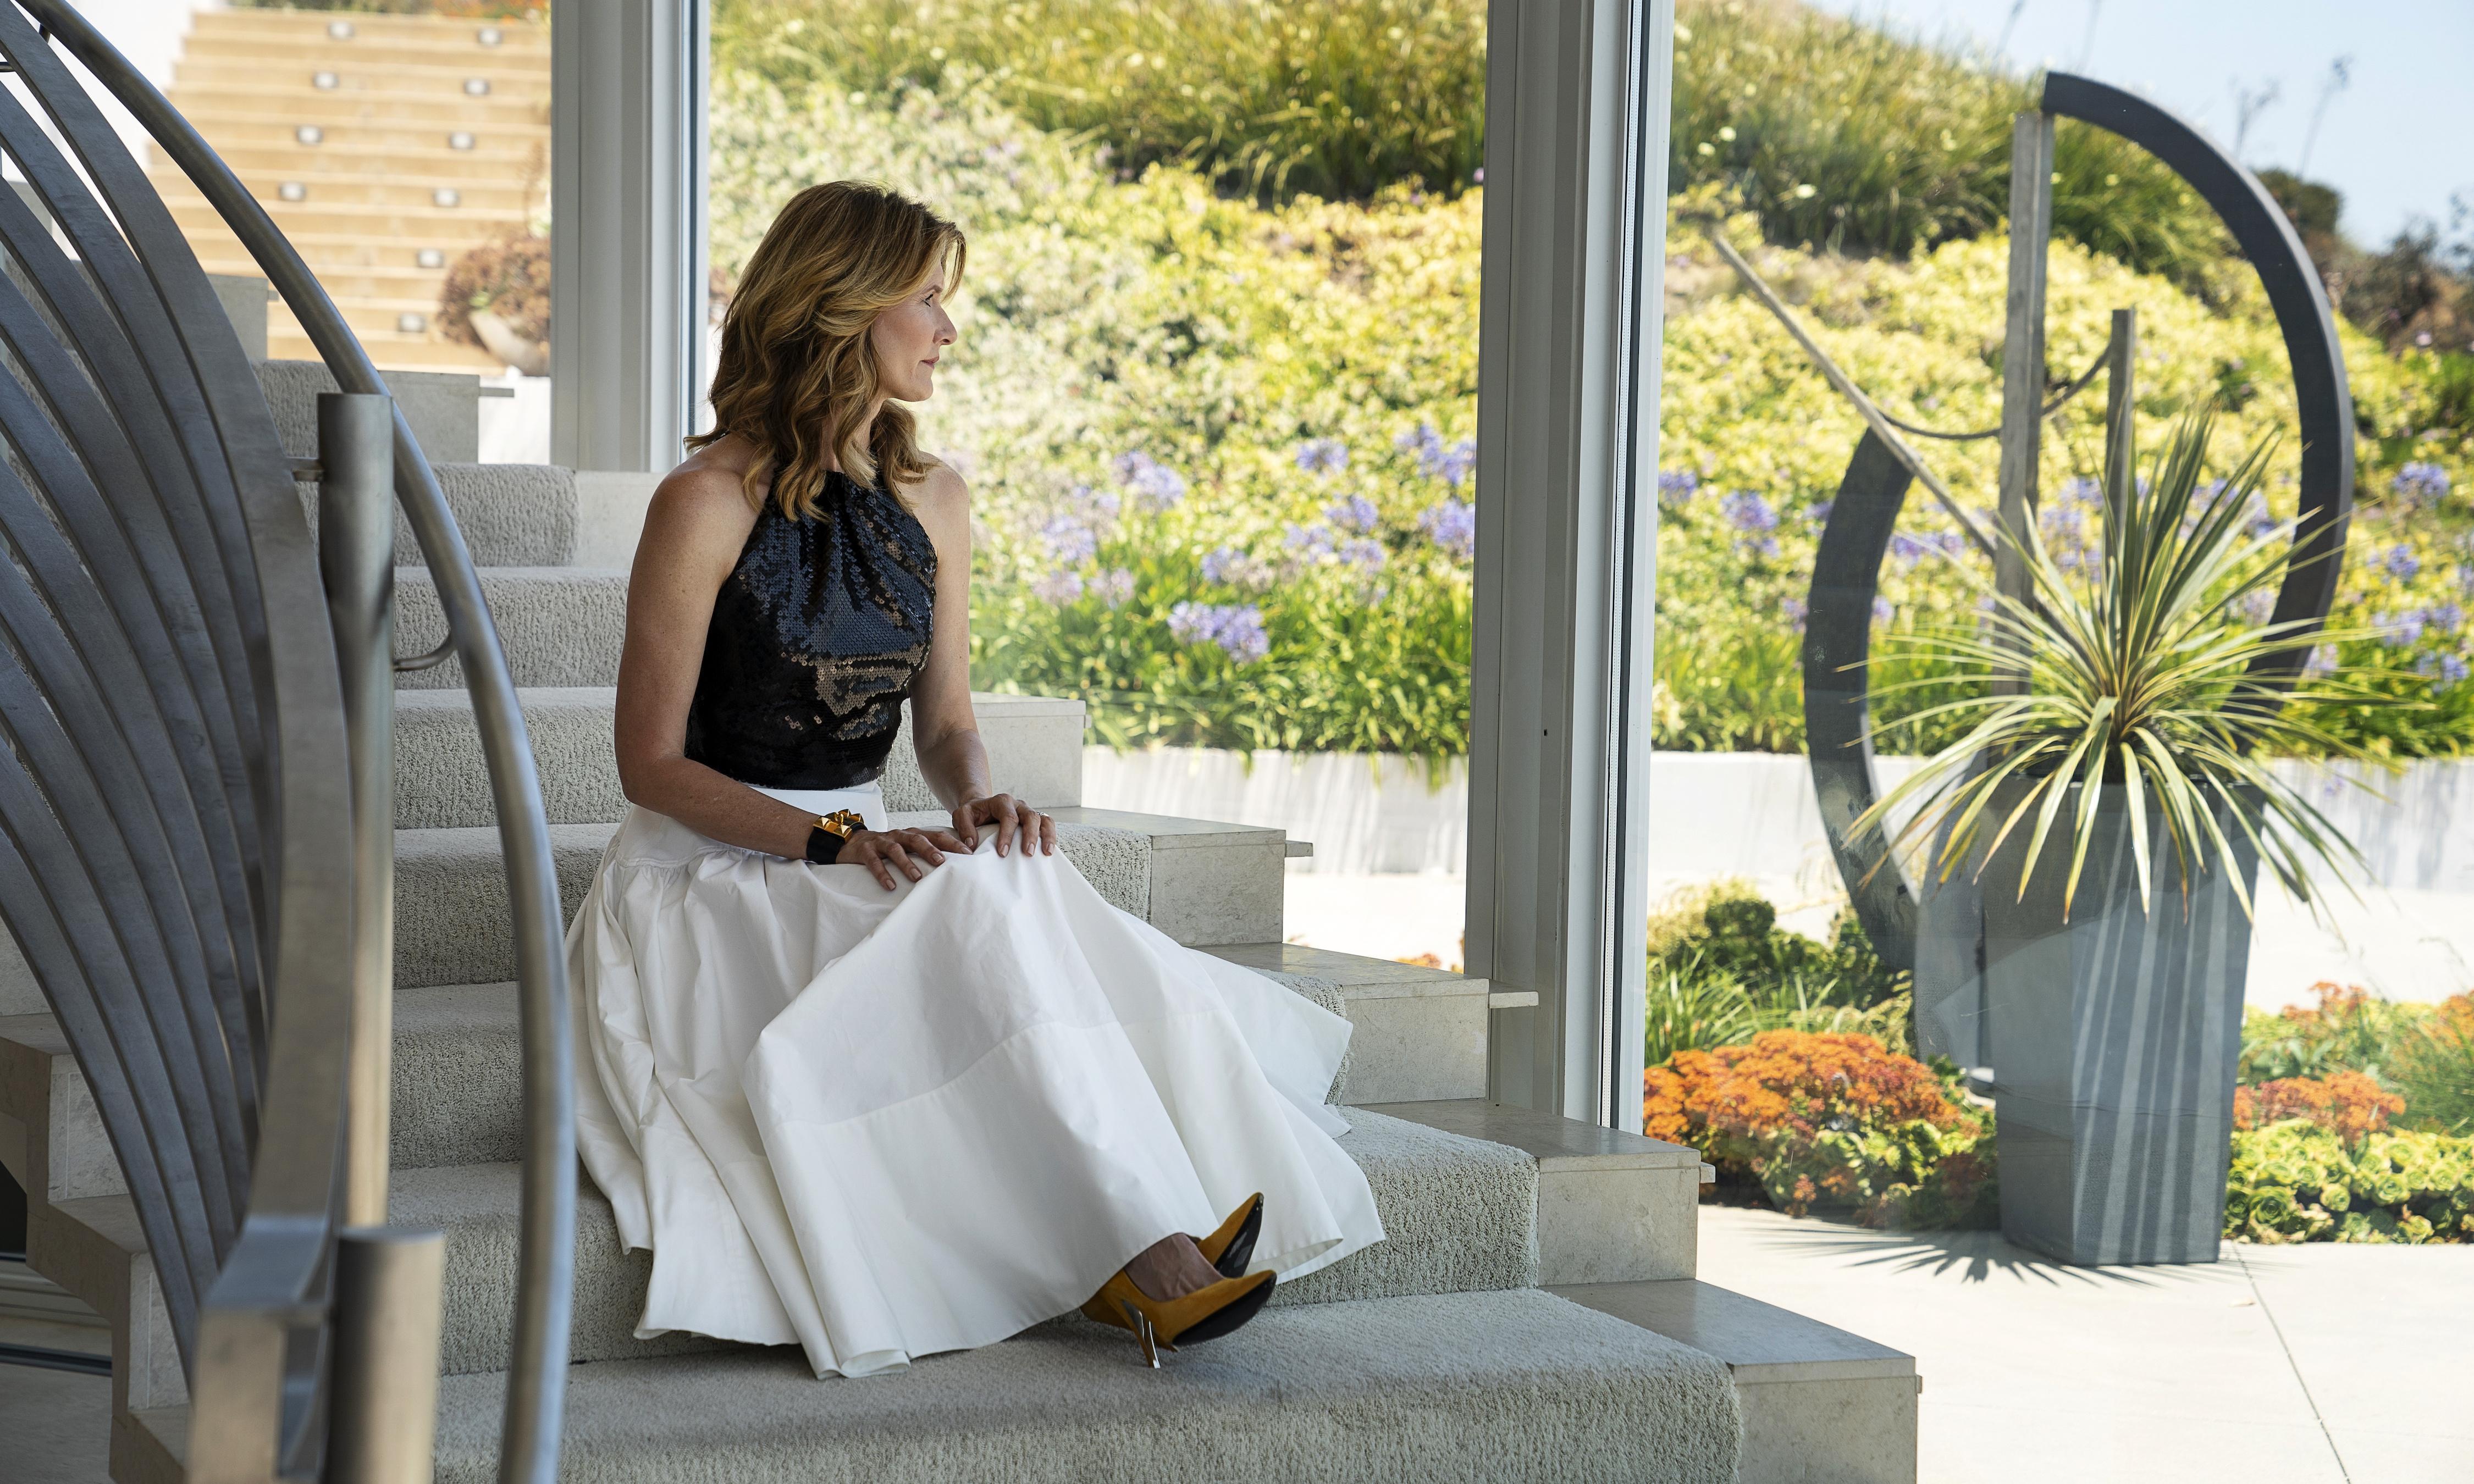 Big Little Lies recap: season two, episode six – The Bad Mother